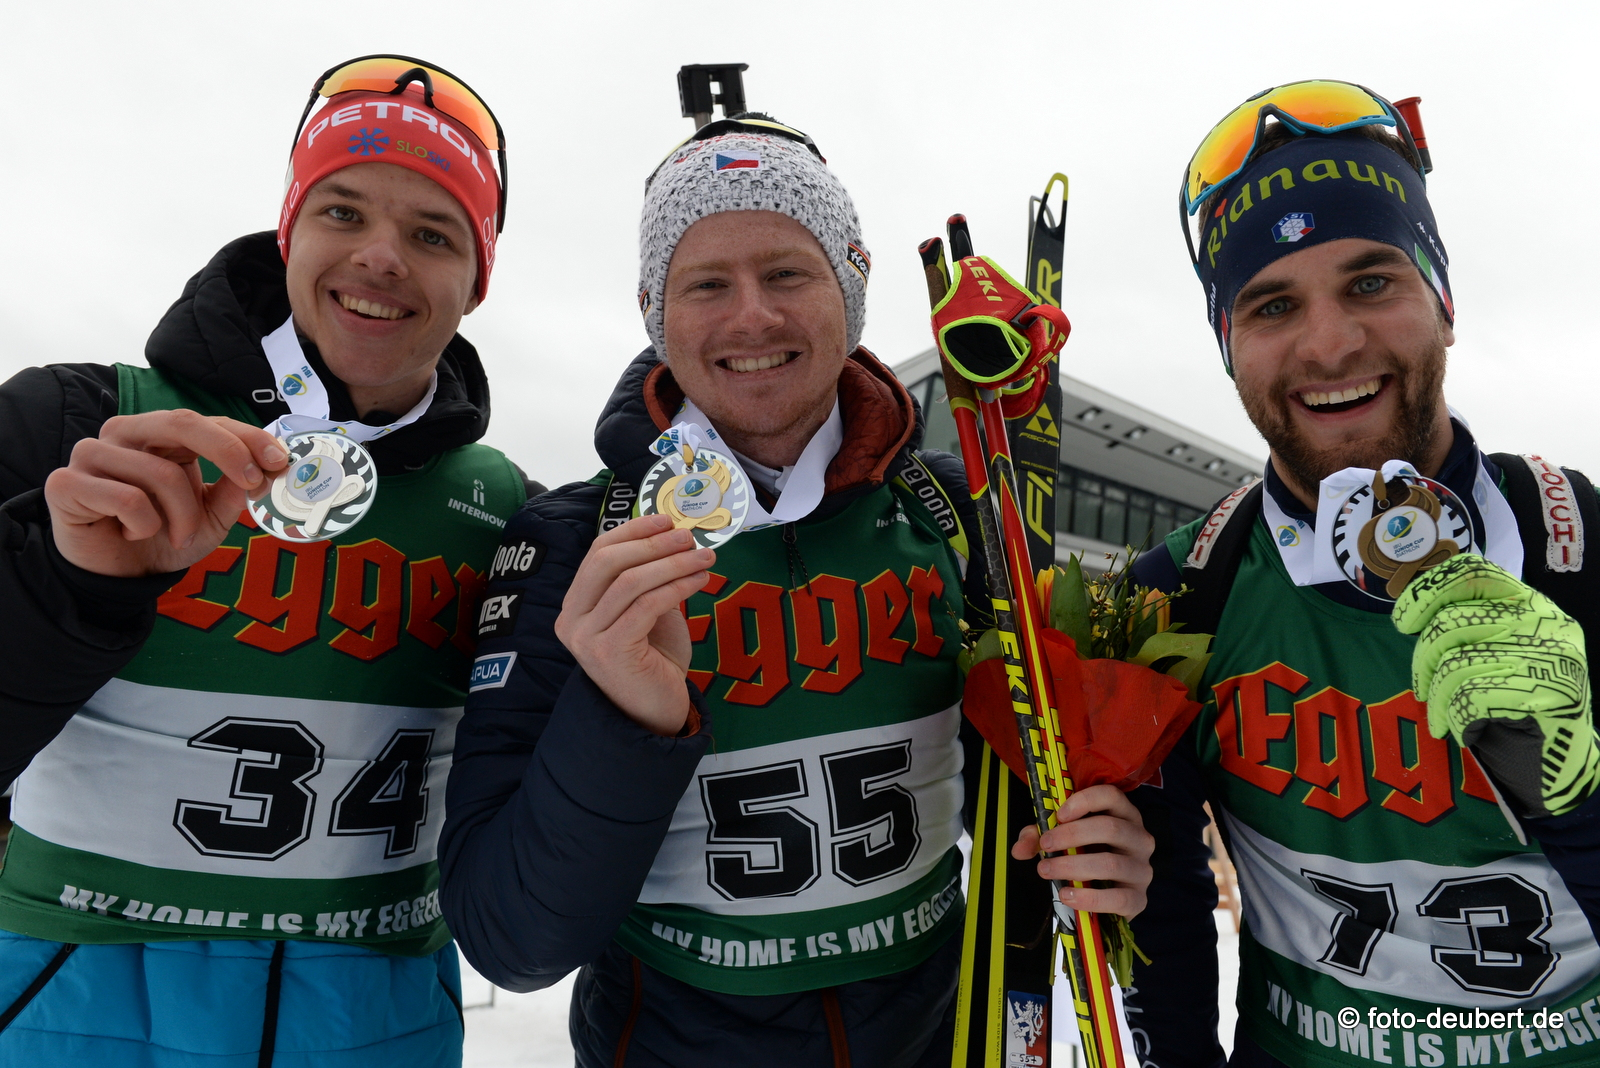 Alex Cisar (SLO), Vitzezslav Hornig (CZE), Patrick Braunhofer (ITA) - Foto: © Harald Deubert